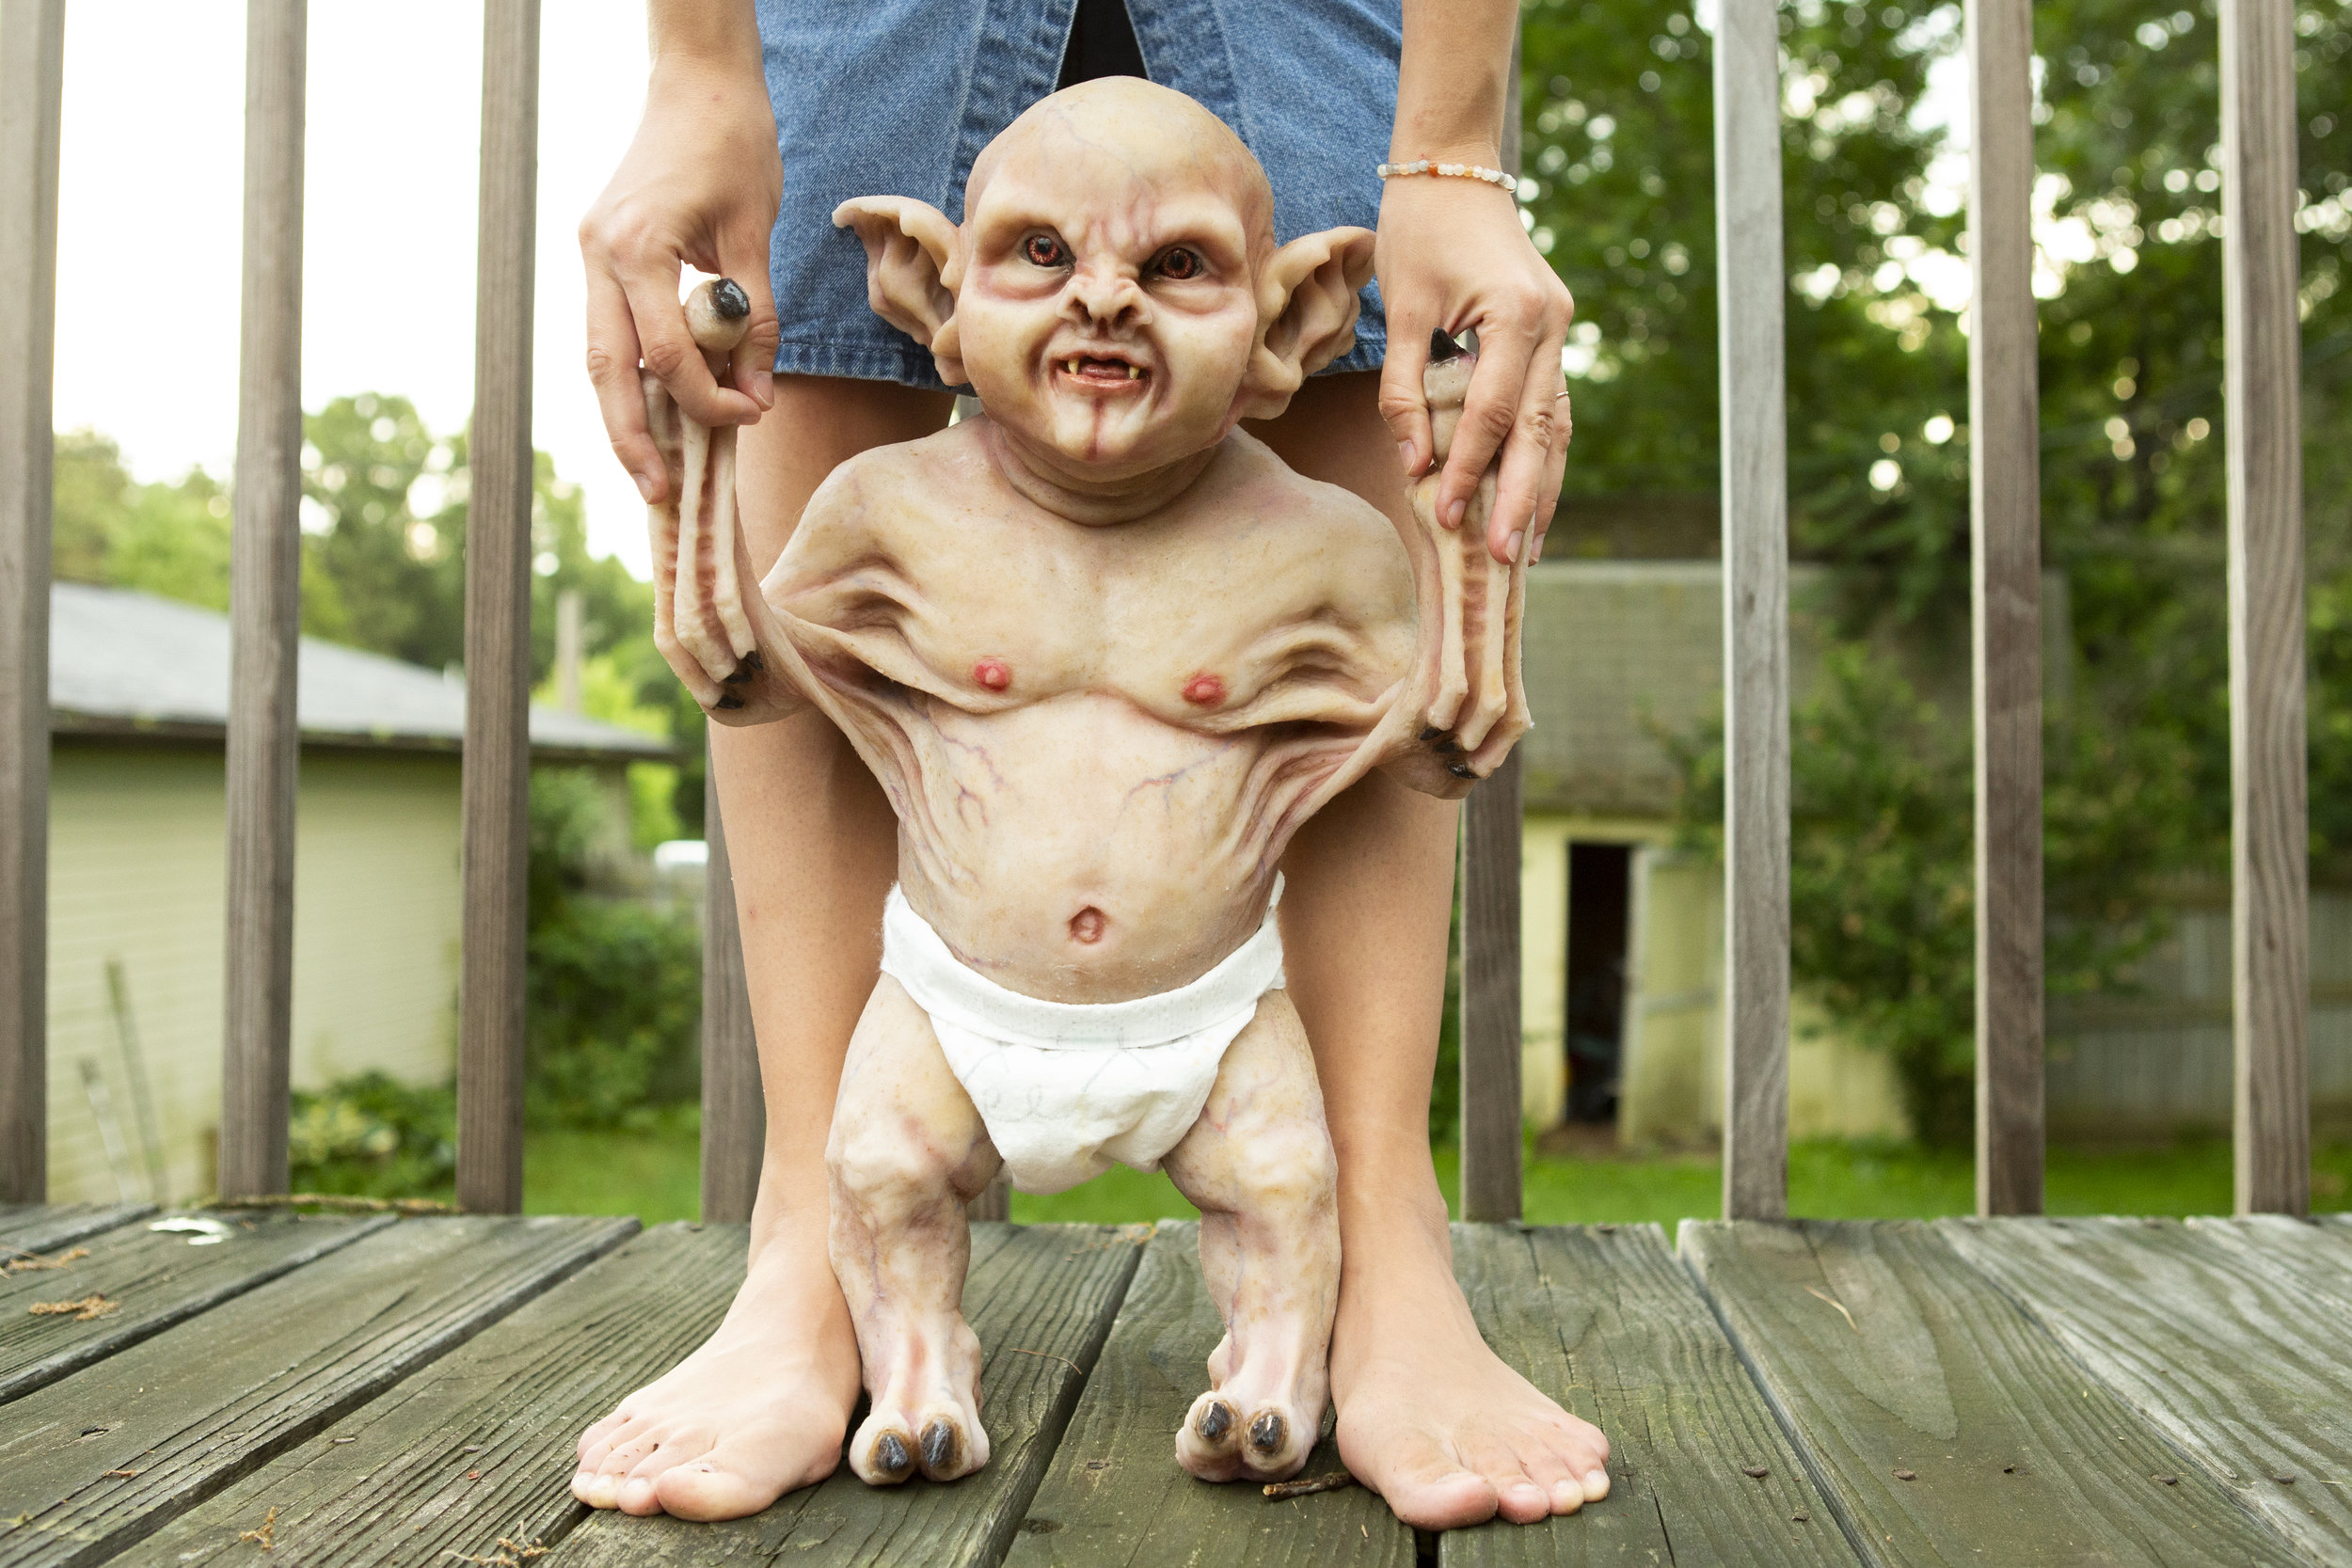 Tiny Demon | Newborn Vampire  | Newborn photoshoot | Ravendark Creations Vampire Baby | Newborn Photoshoots | Alyssia Booth's Candid & Studio | www.abcandidstudio.com